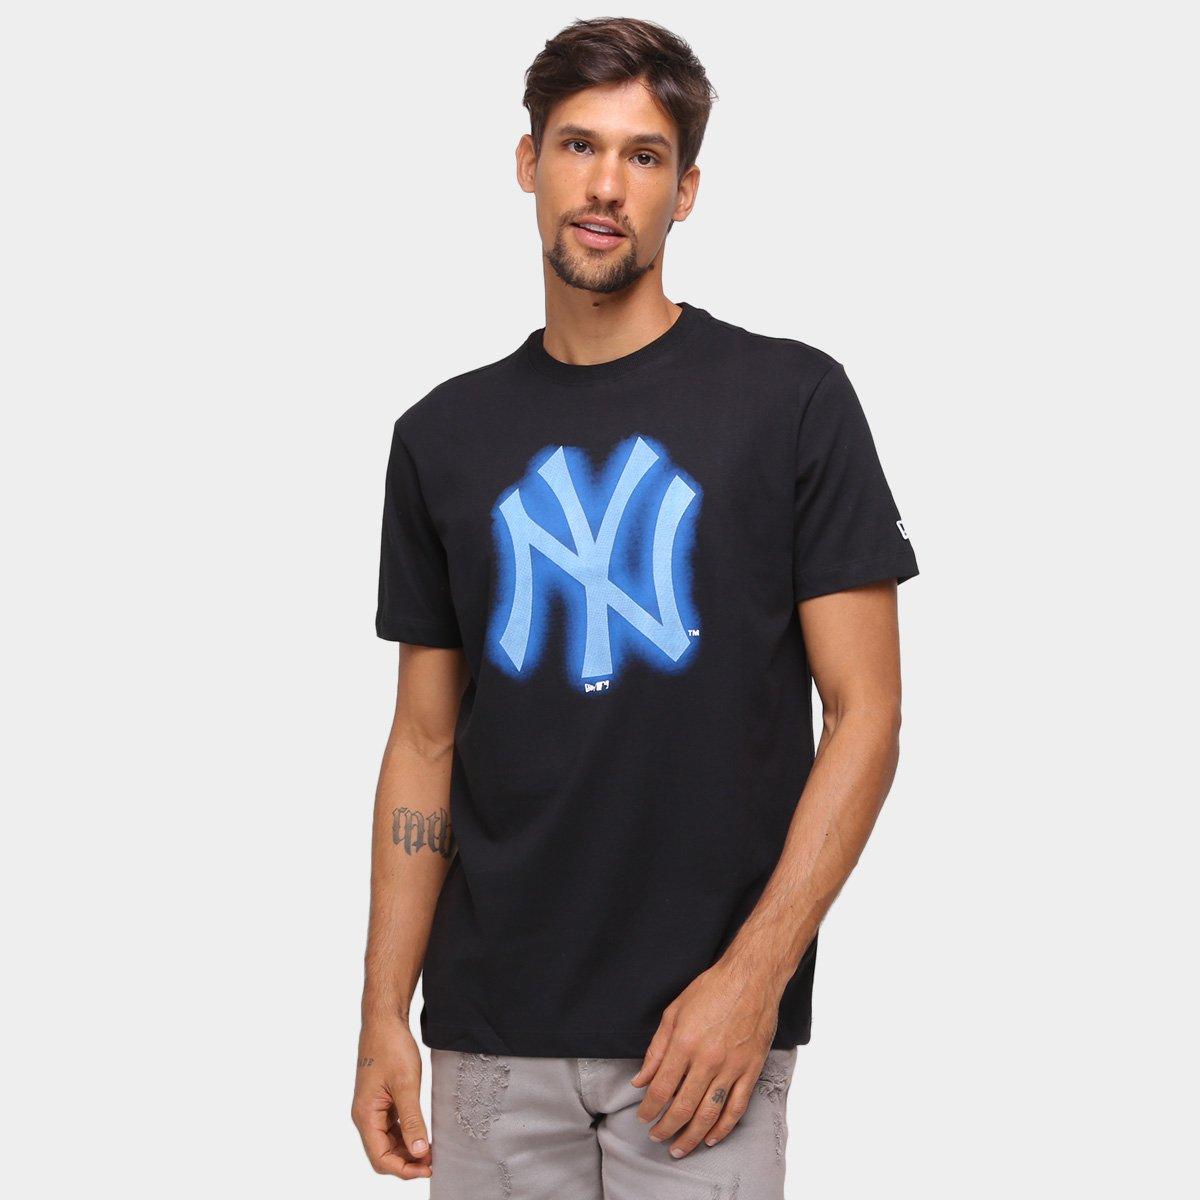 Camiseta MLB New York Yankees New Era Rave Space Glow Masculina